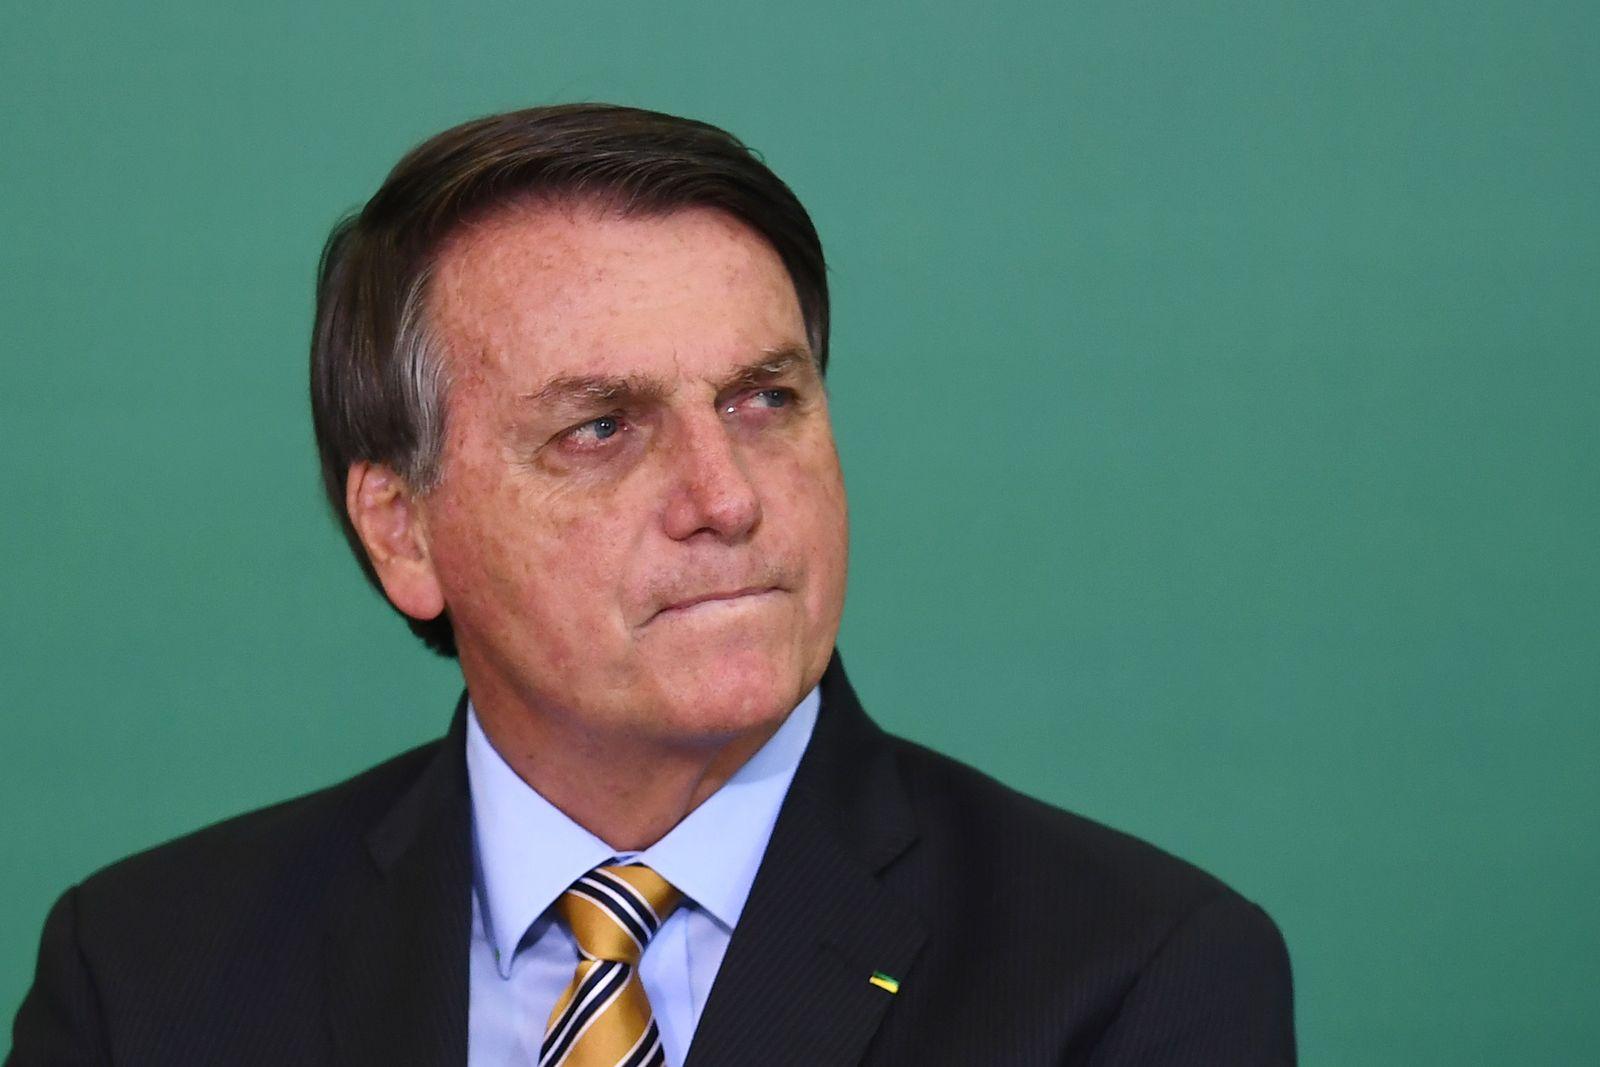 BRAZIL-POLITICS-BOLSONARO-TOURISM